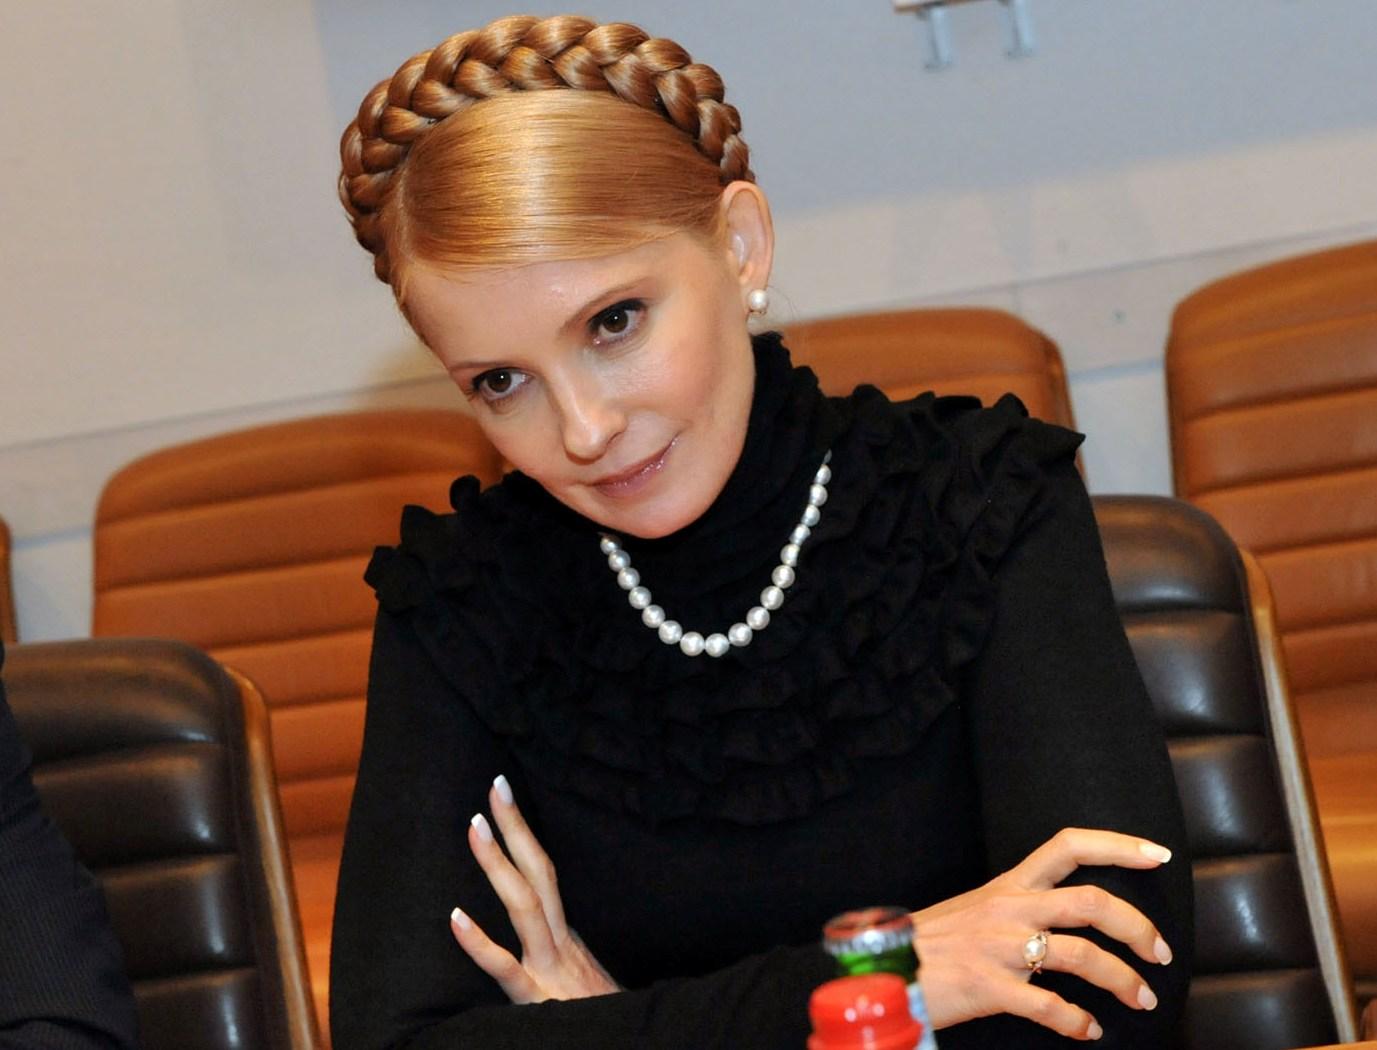 Тимошенко приписали охоту на покемонов